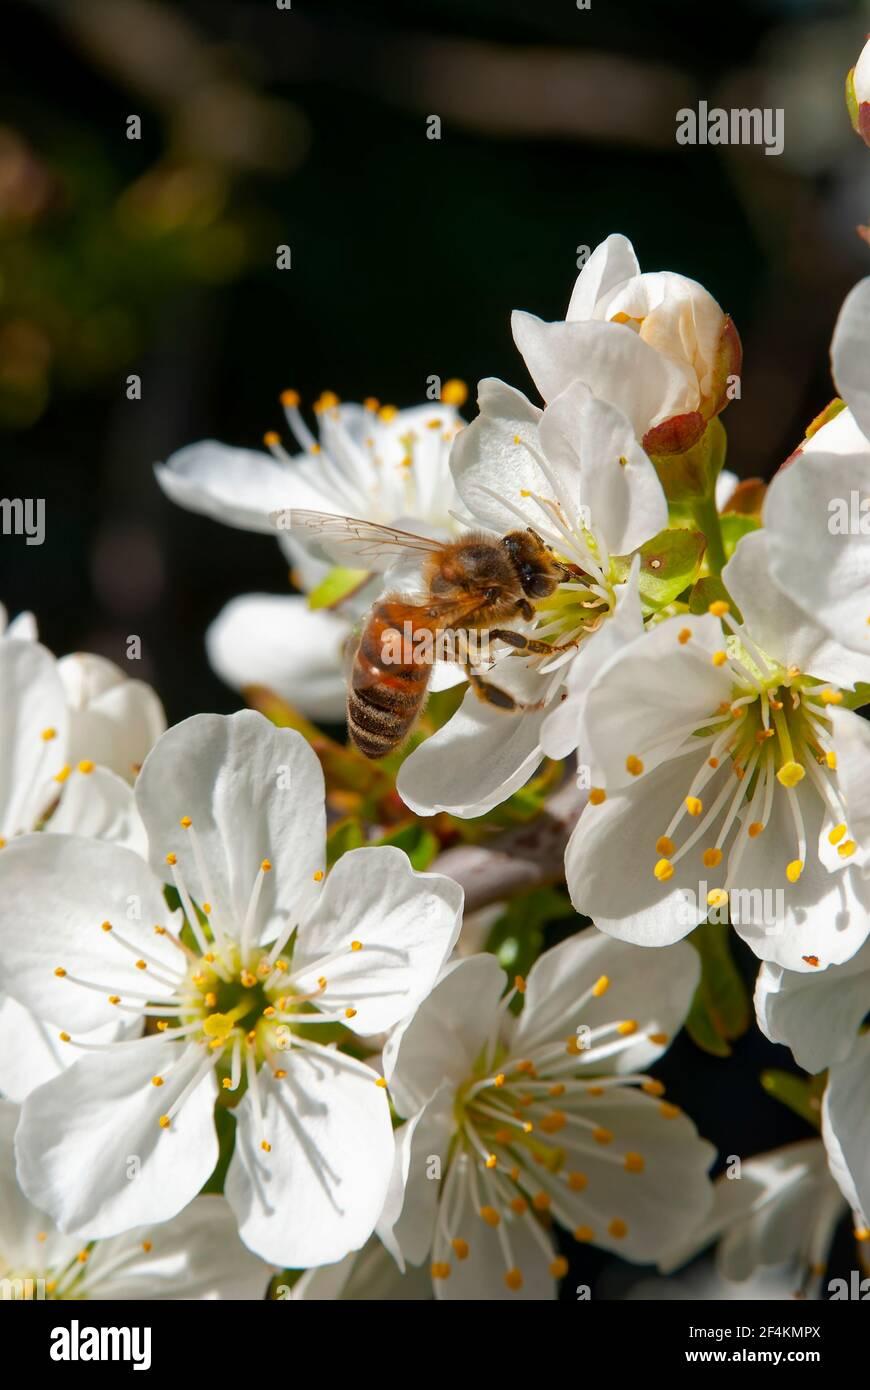 Abeja melífera Carniolan (Apis mellifera carnica) en flor de cerezo. Foto de stock